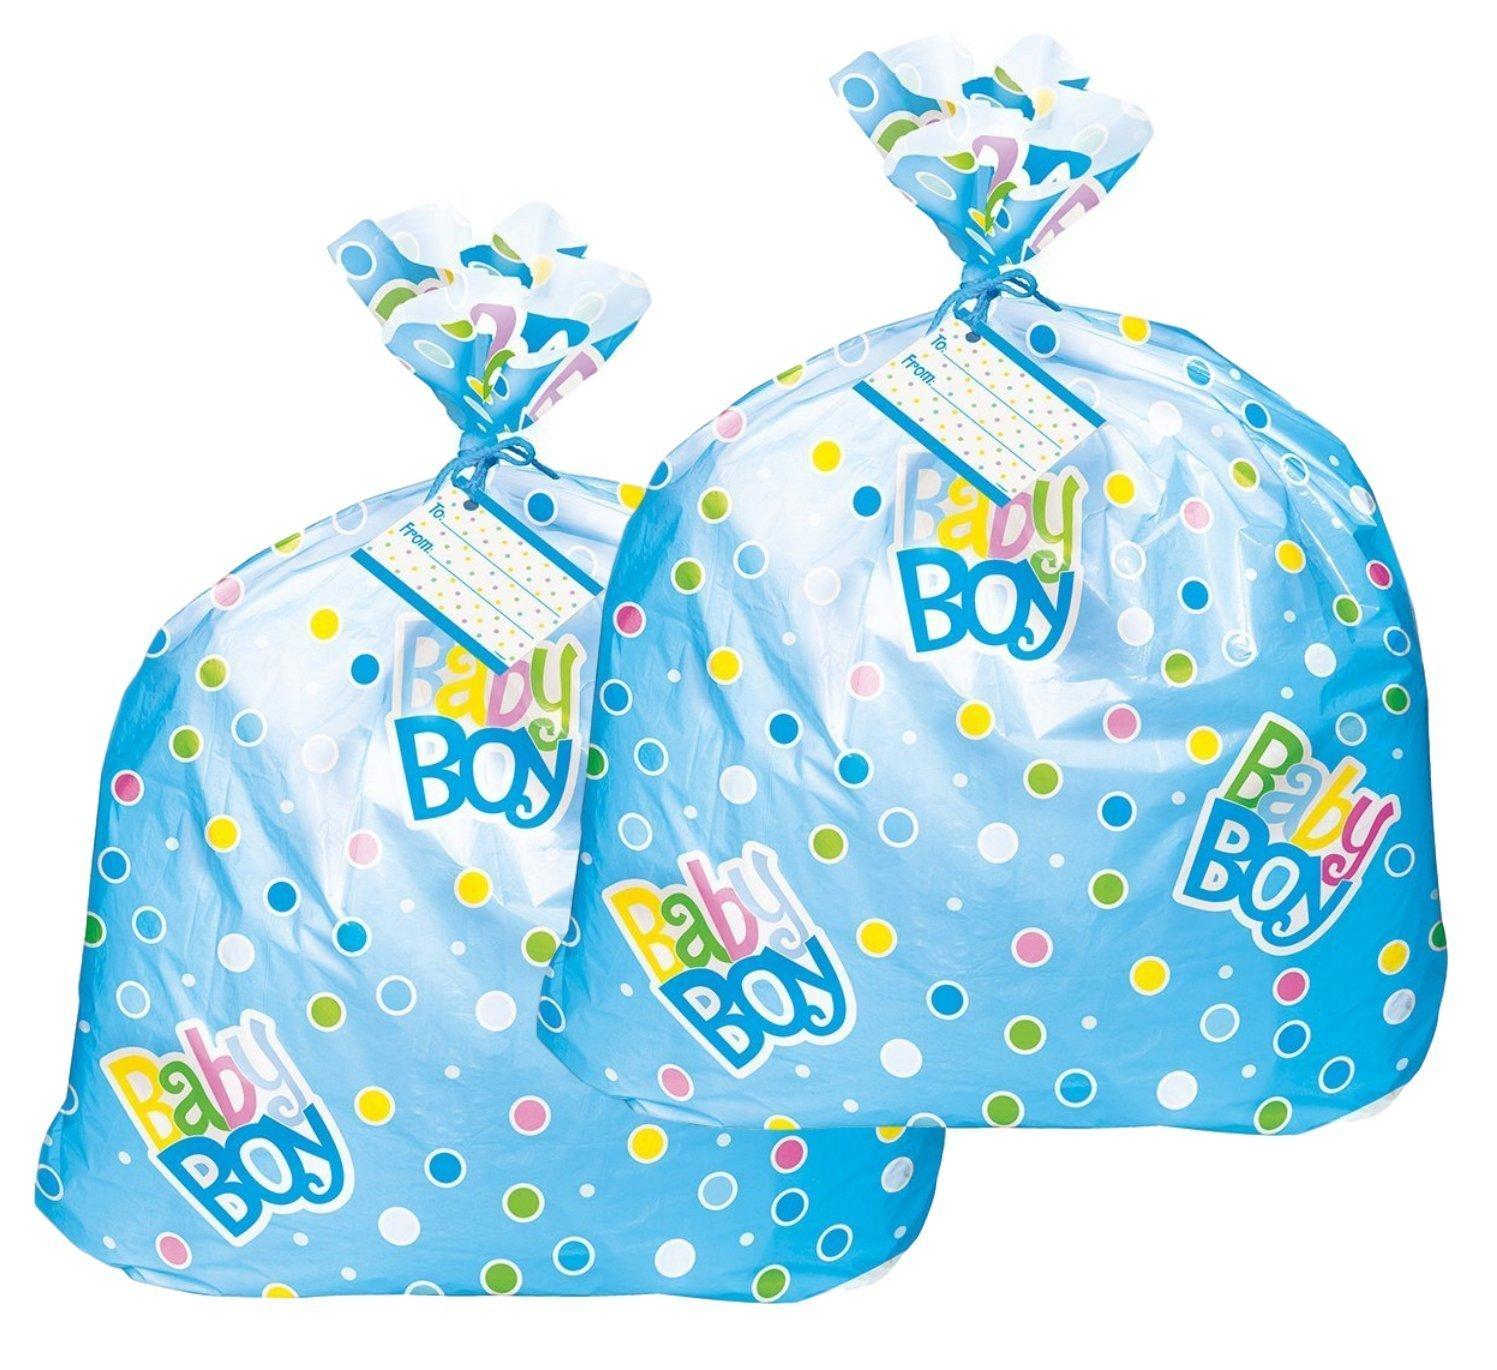 Jumbo Plastic Blue Polka Dot Boy Baby Shower Gift Bags (2) Unique